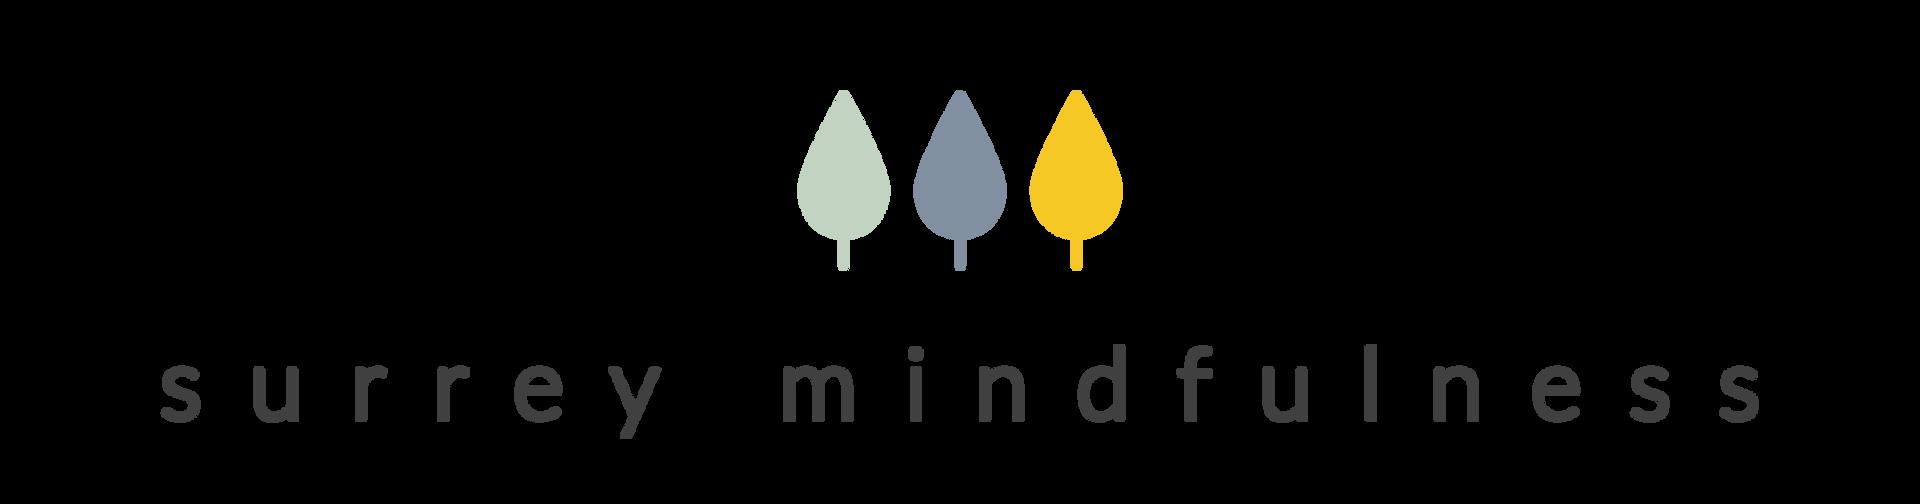 Coaching Branding | Brand Identity Design by Fresh Leaf Creative | Dorset Brand Designer & Photographer